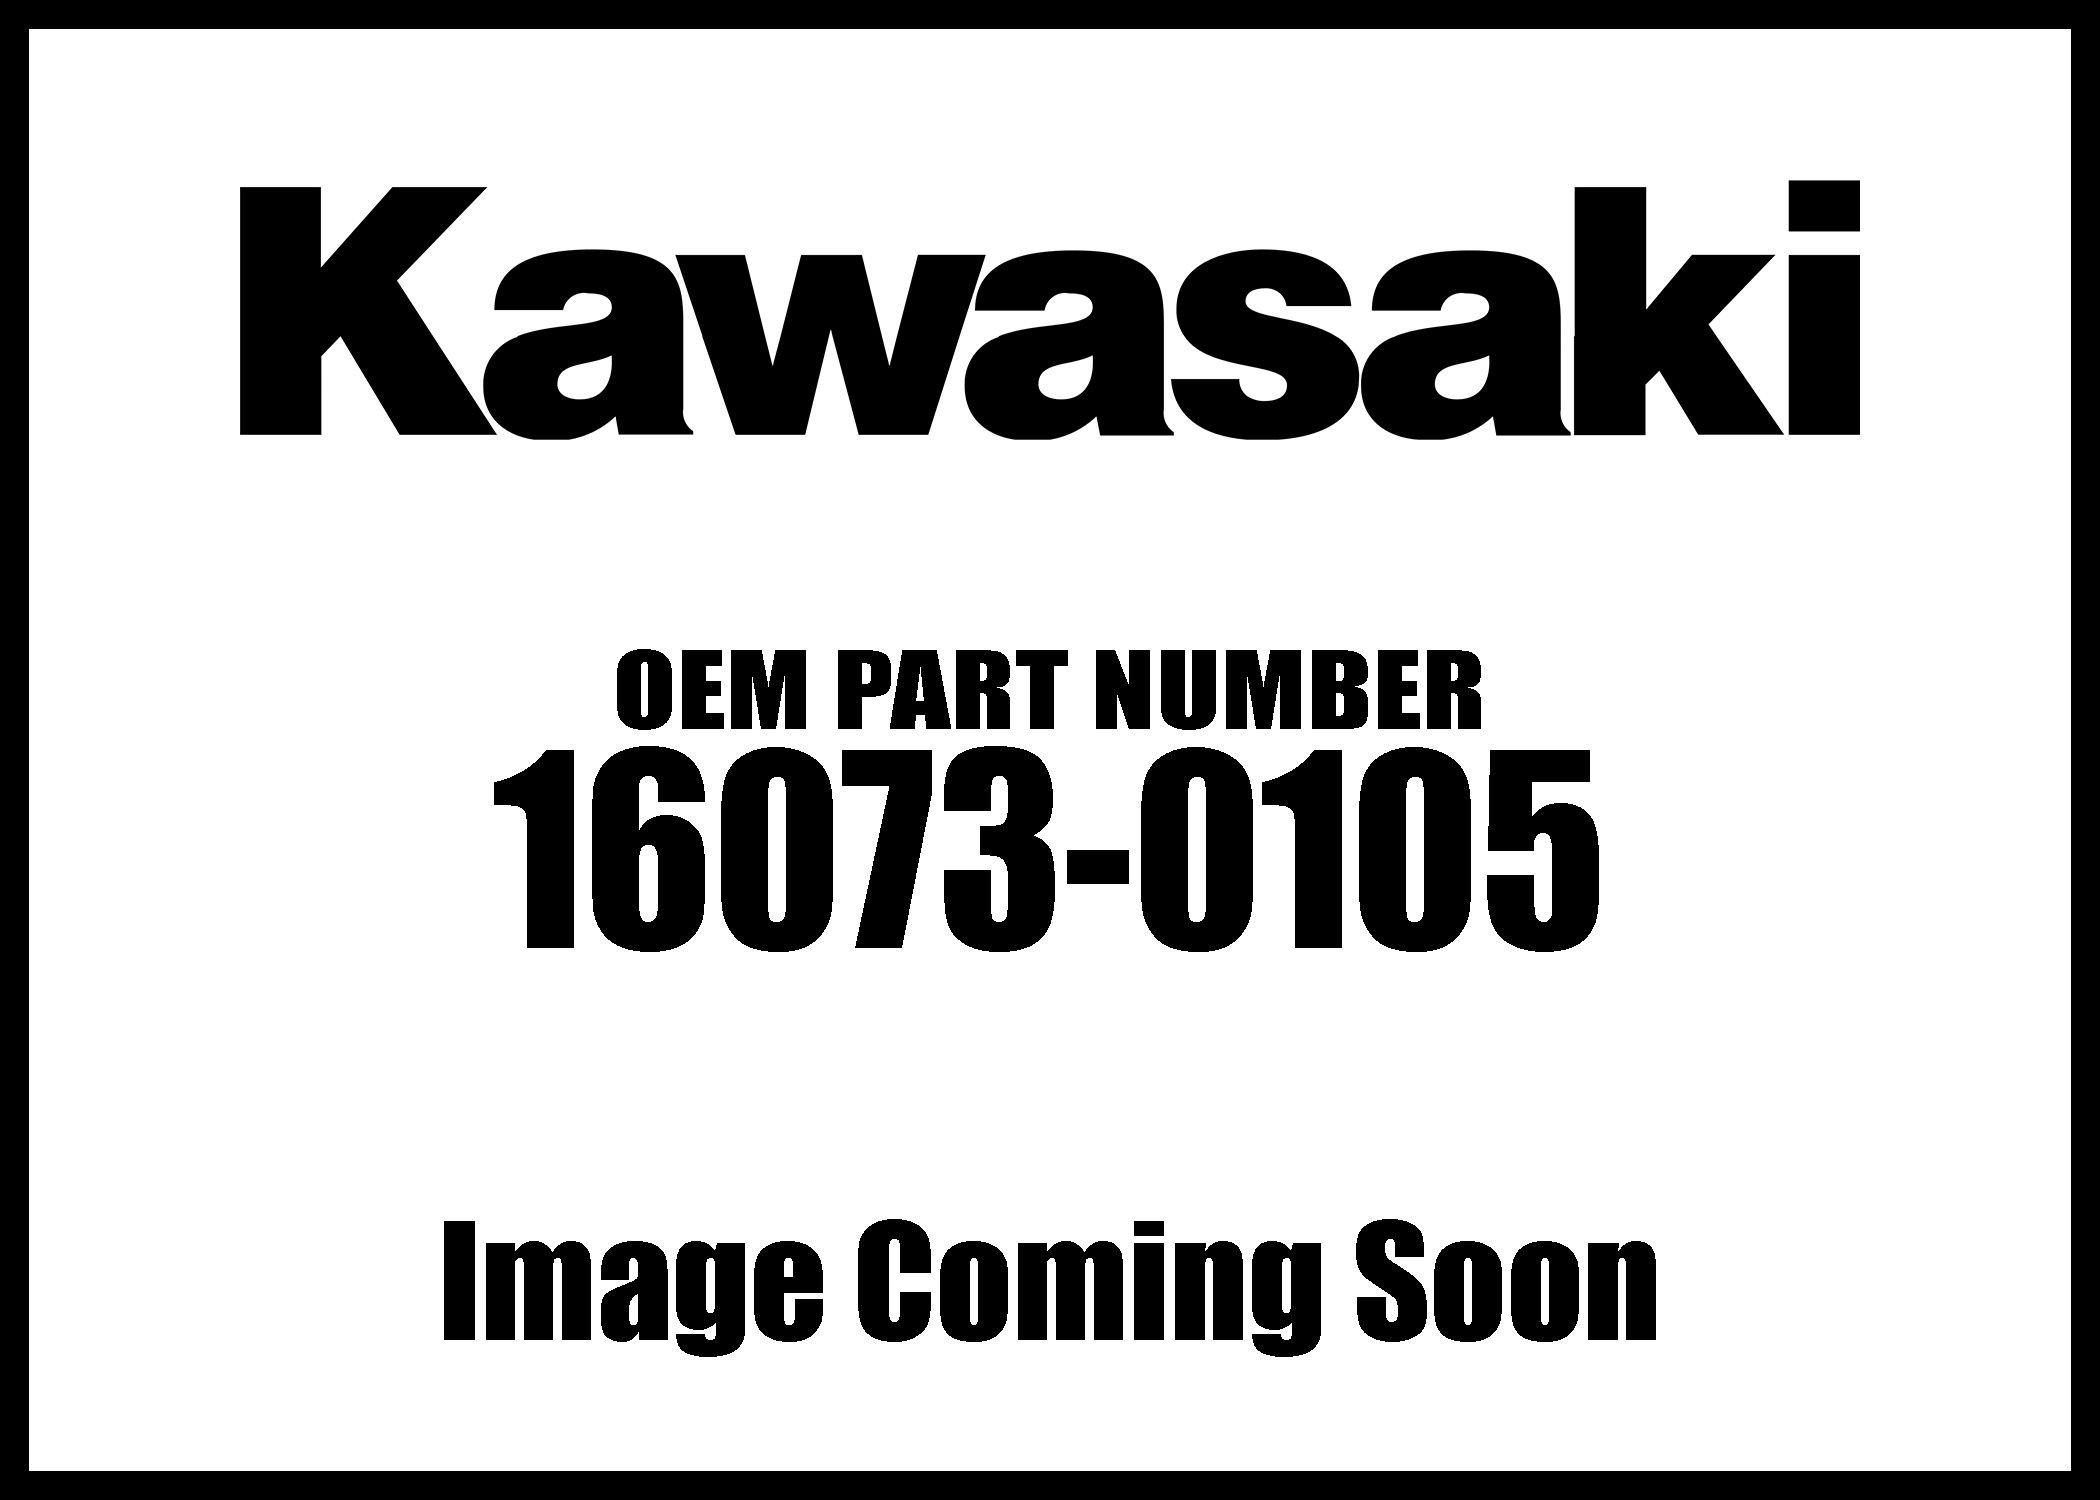 Kawasaki 2009 Teryx 750 4X4 Nra Outdoors Teryx 750 Fi 4X4 Sport C Leg Cover Insulator 16073-0105 New Oem by Kawasaki (Image #1)